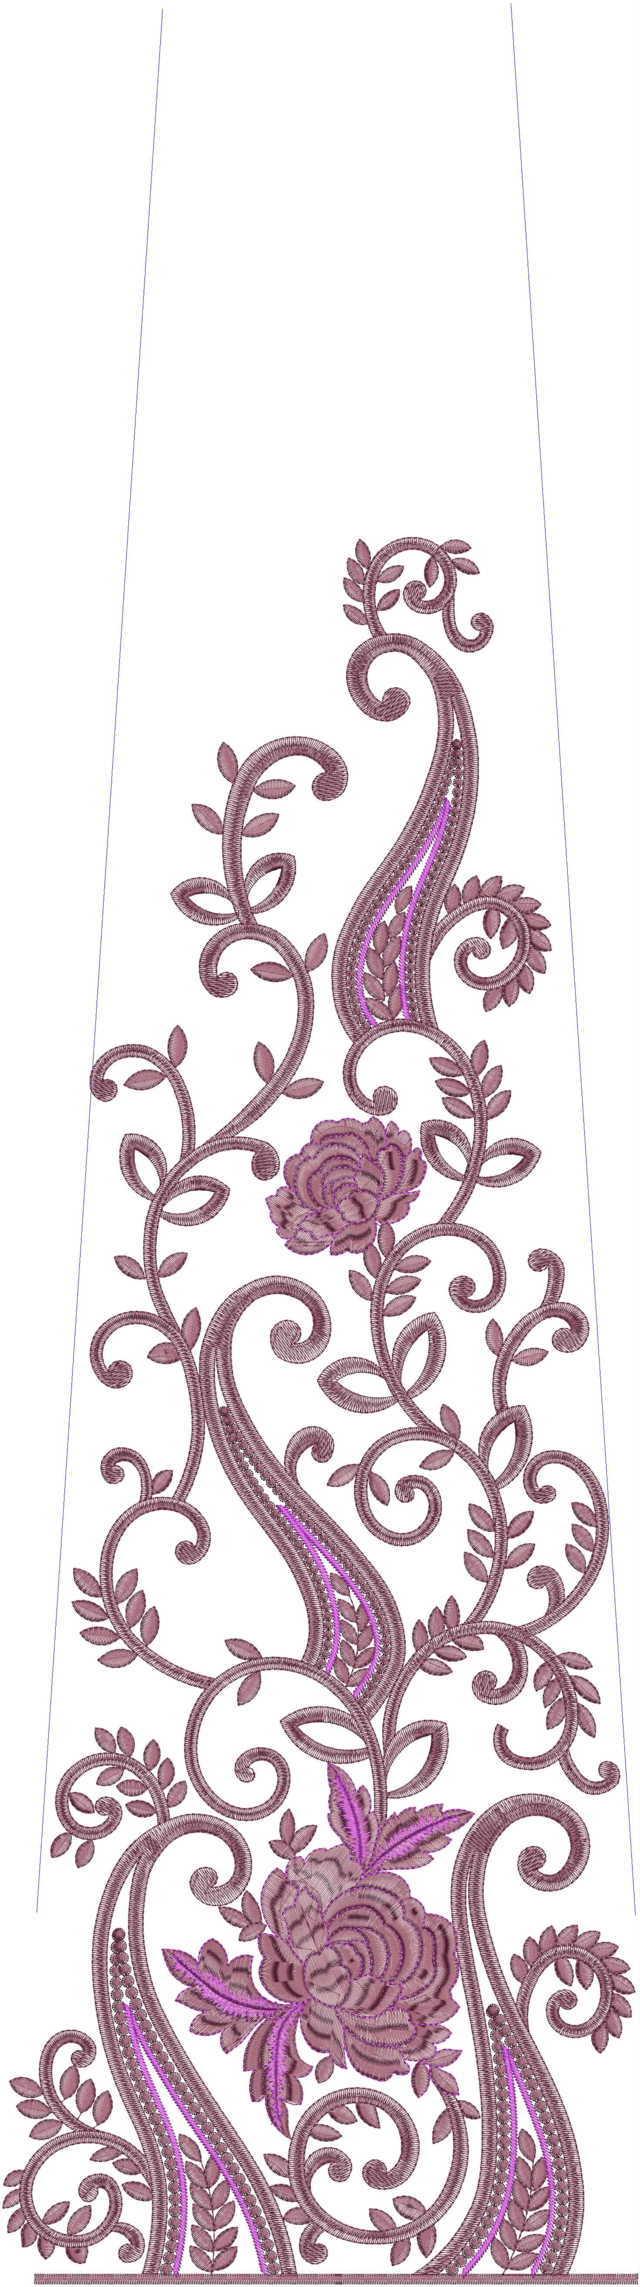 Awesome rose flower concept Rajasthani test Lehenga / kali Embroidery Design